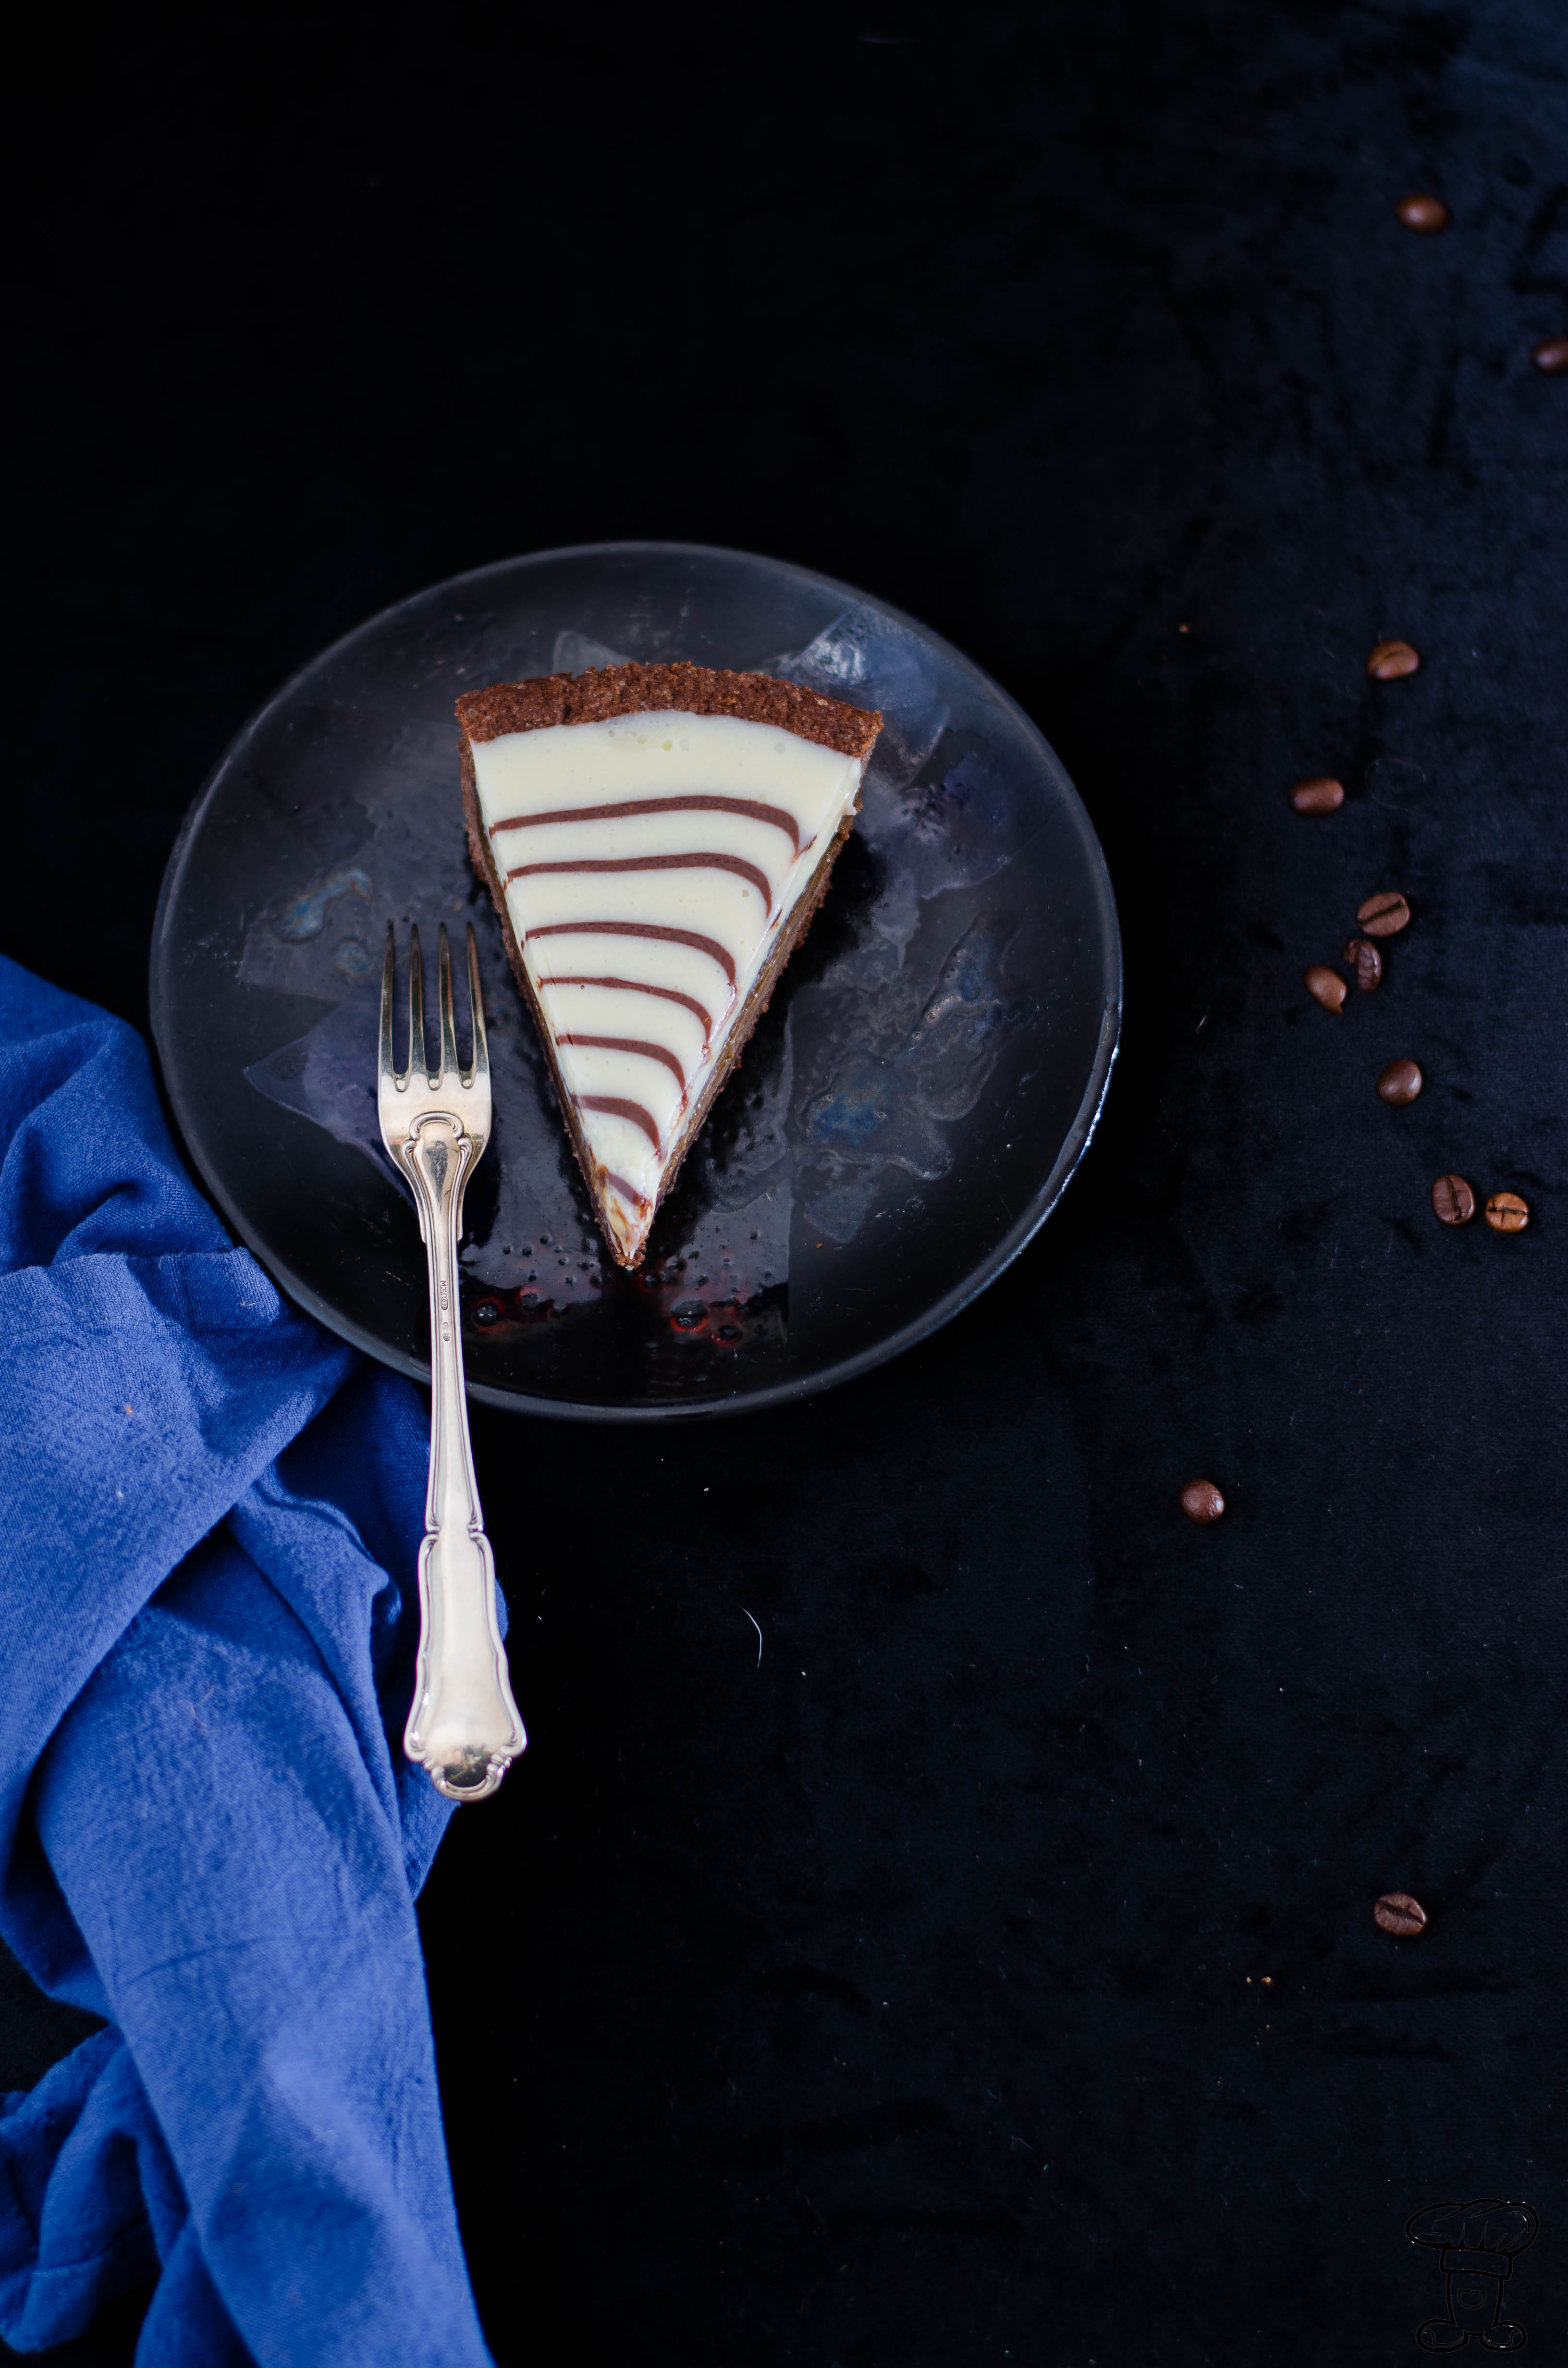 torta_mocaccino_knam6 Torta mocaccino di Knam